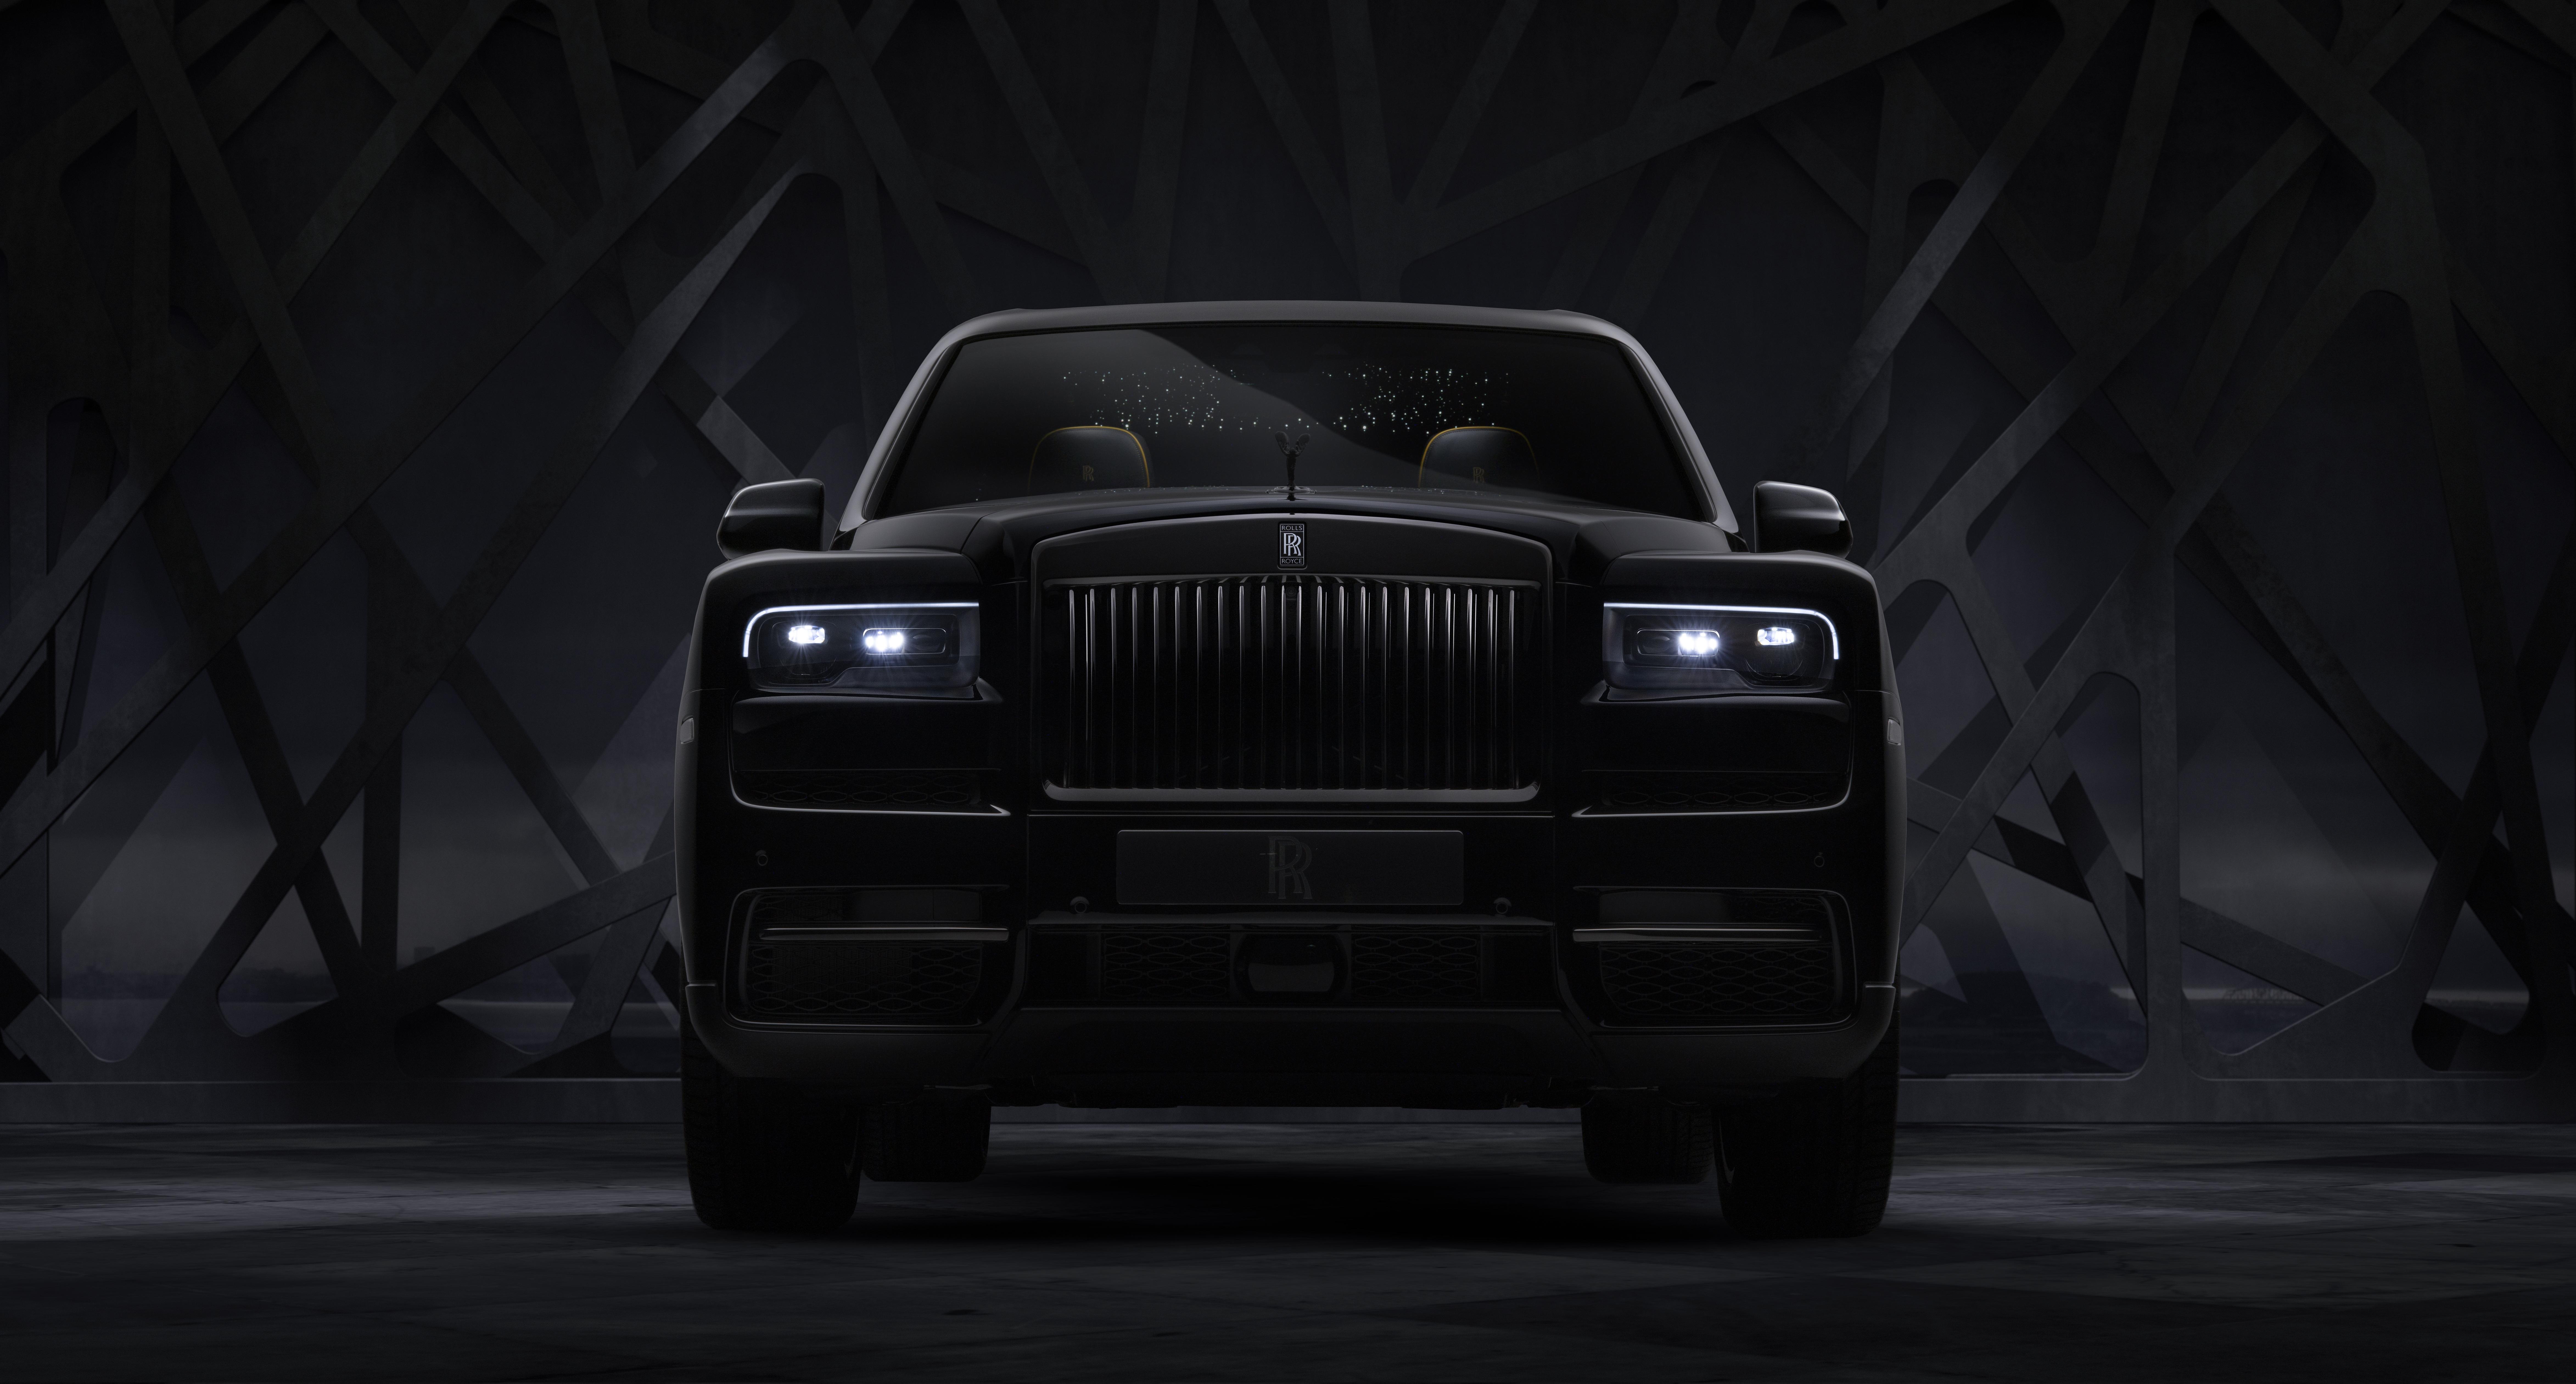 rolls royce cullinan black badge 2019 1574936509 - Rolls Royce Cullinan Black Badge 2019 -